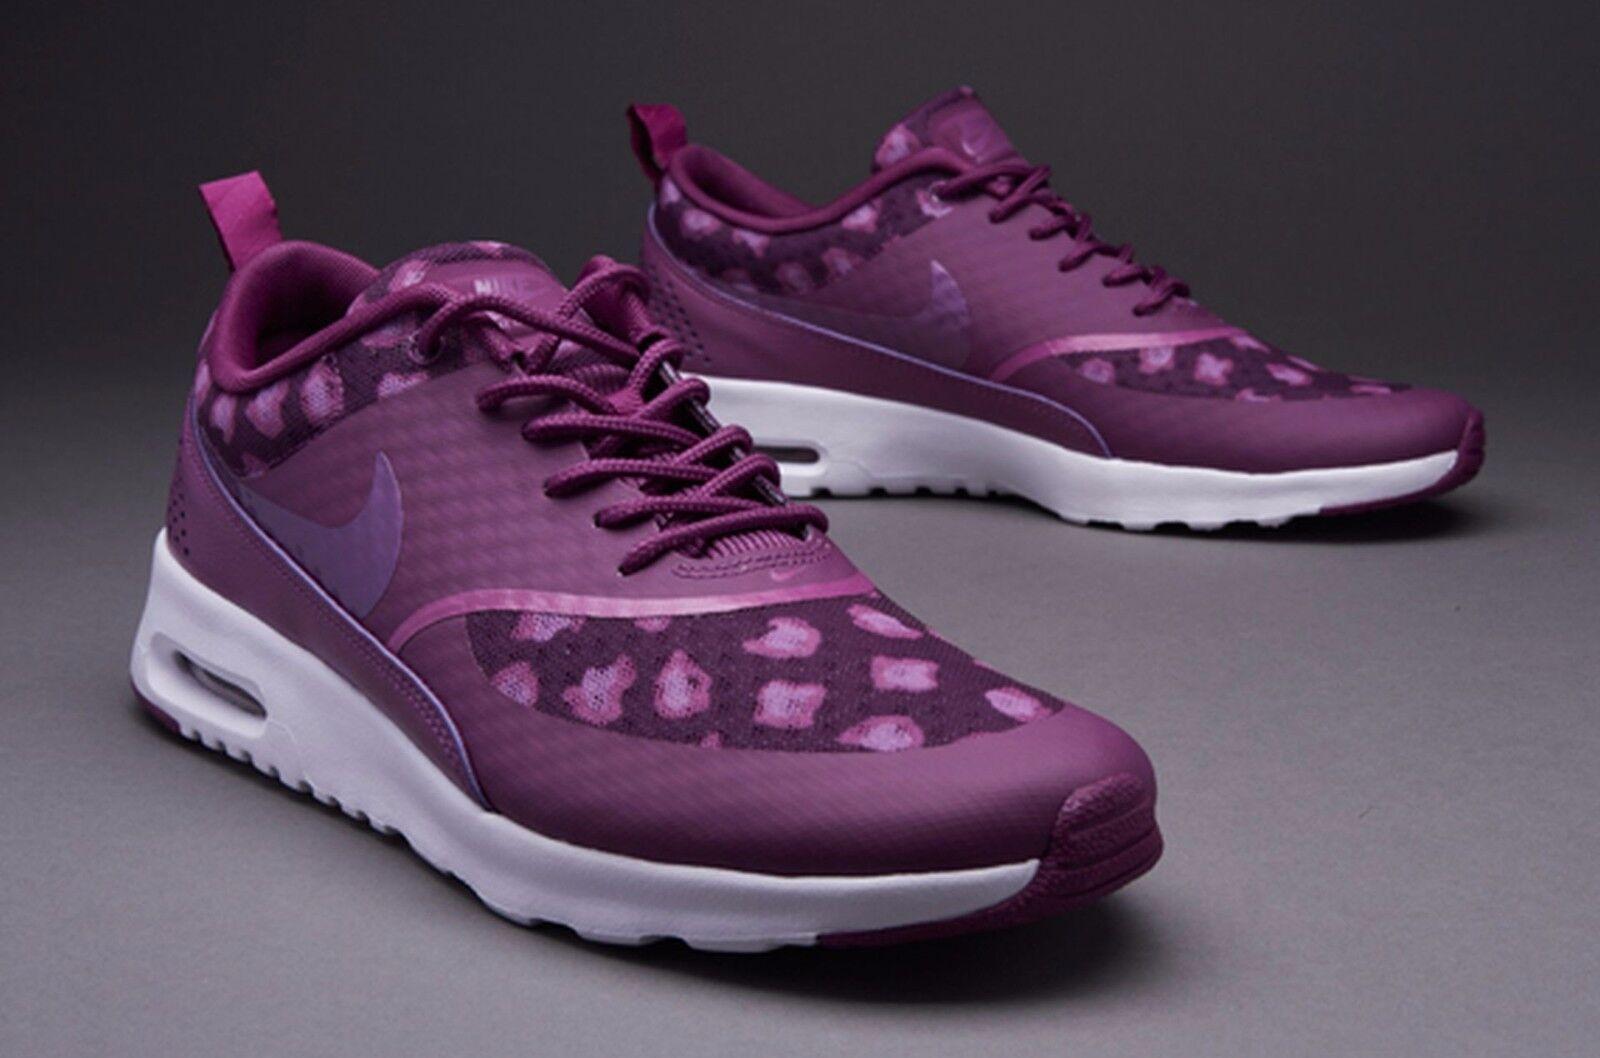 Nike Air Max Thea Print 599408 501 Berry Fuchsia Flash Fuchsia Glow Wmn Sz 7